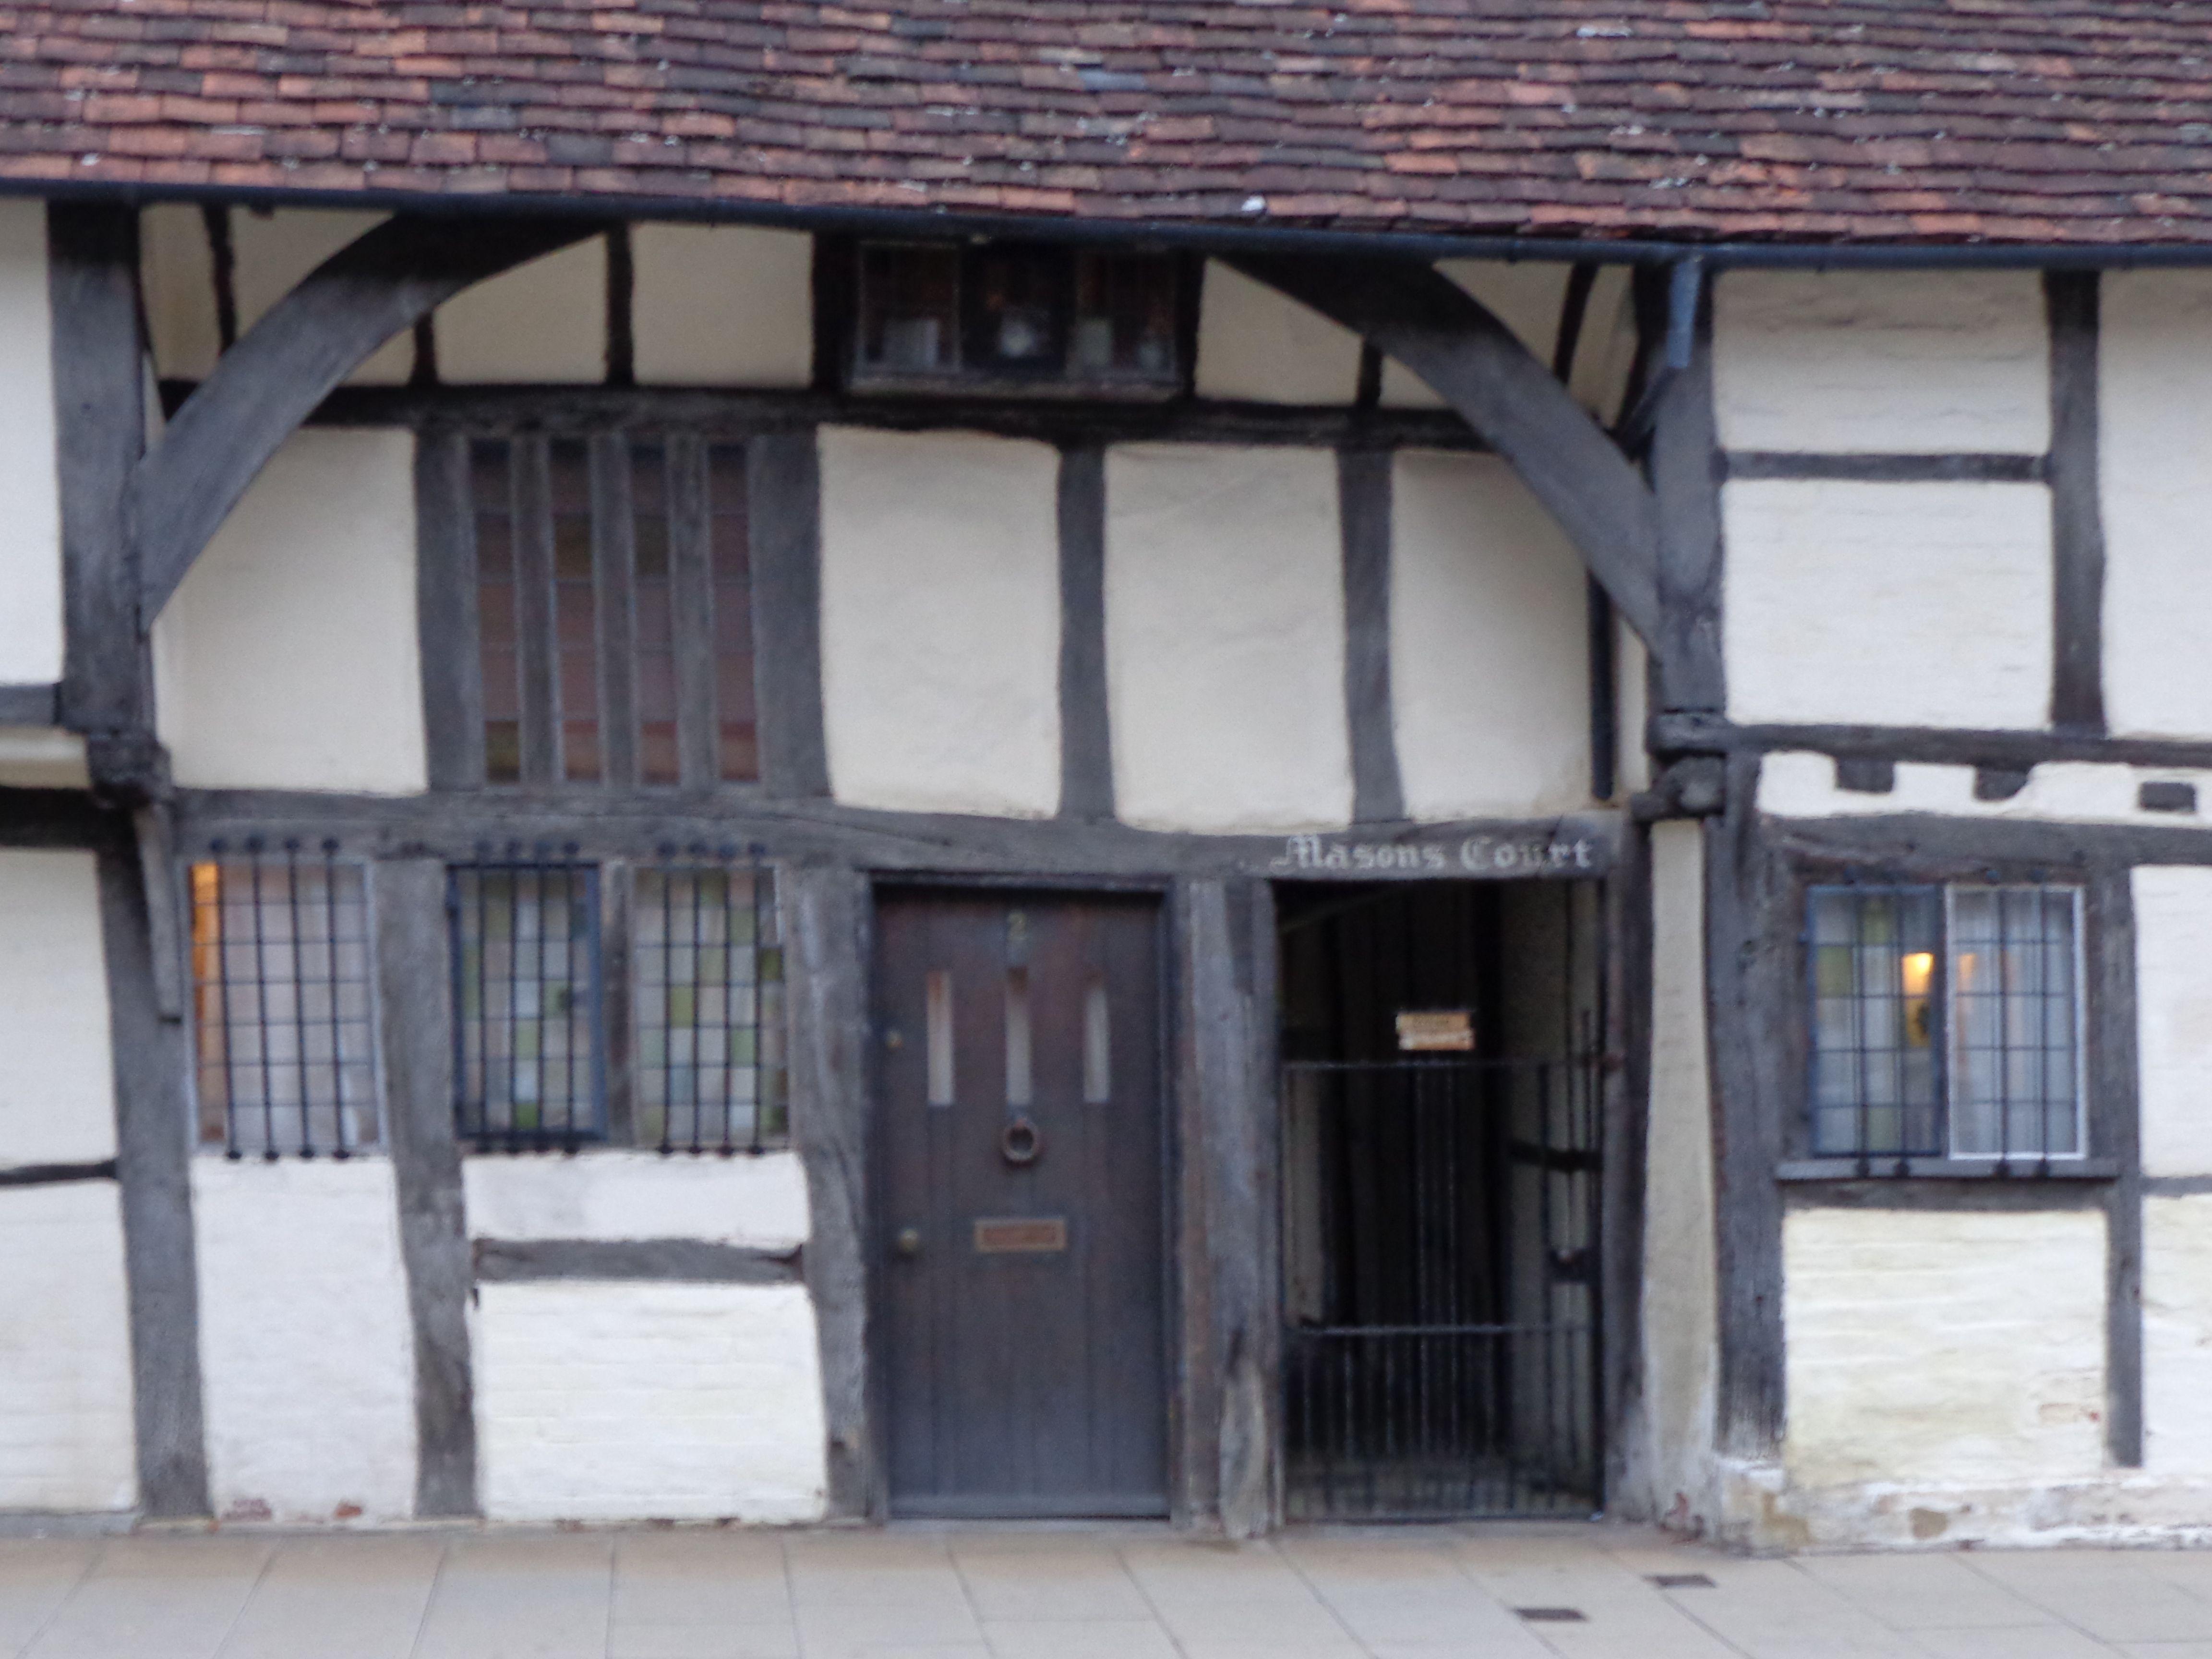 Stradford-upon-Avon · AvonWindowsDoors & Stradford-upon-Avon | Doors and windows | Pinterest